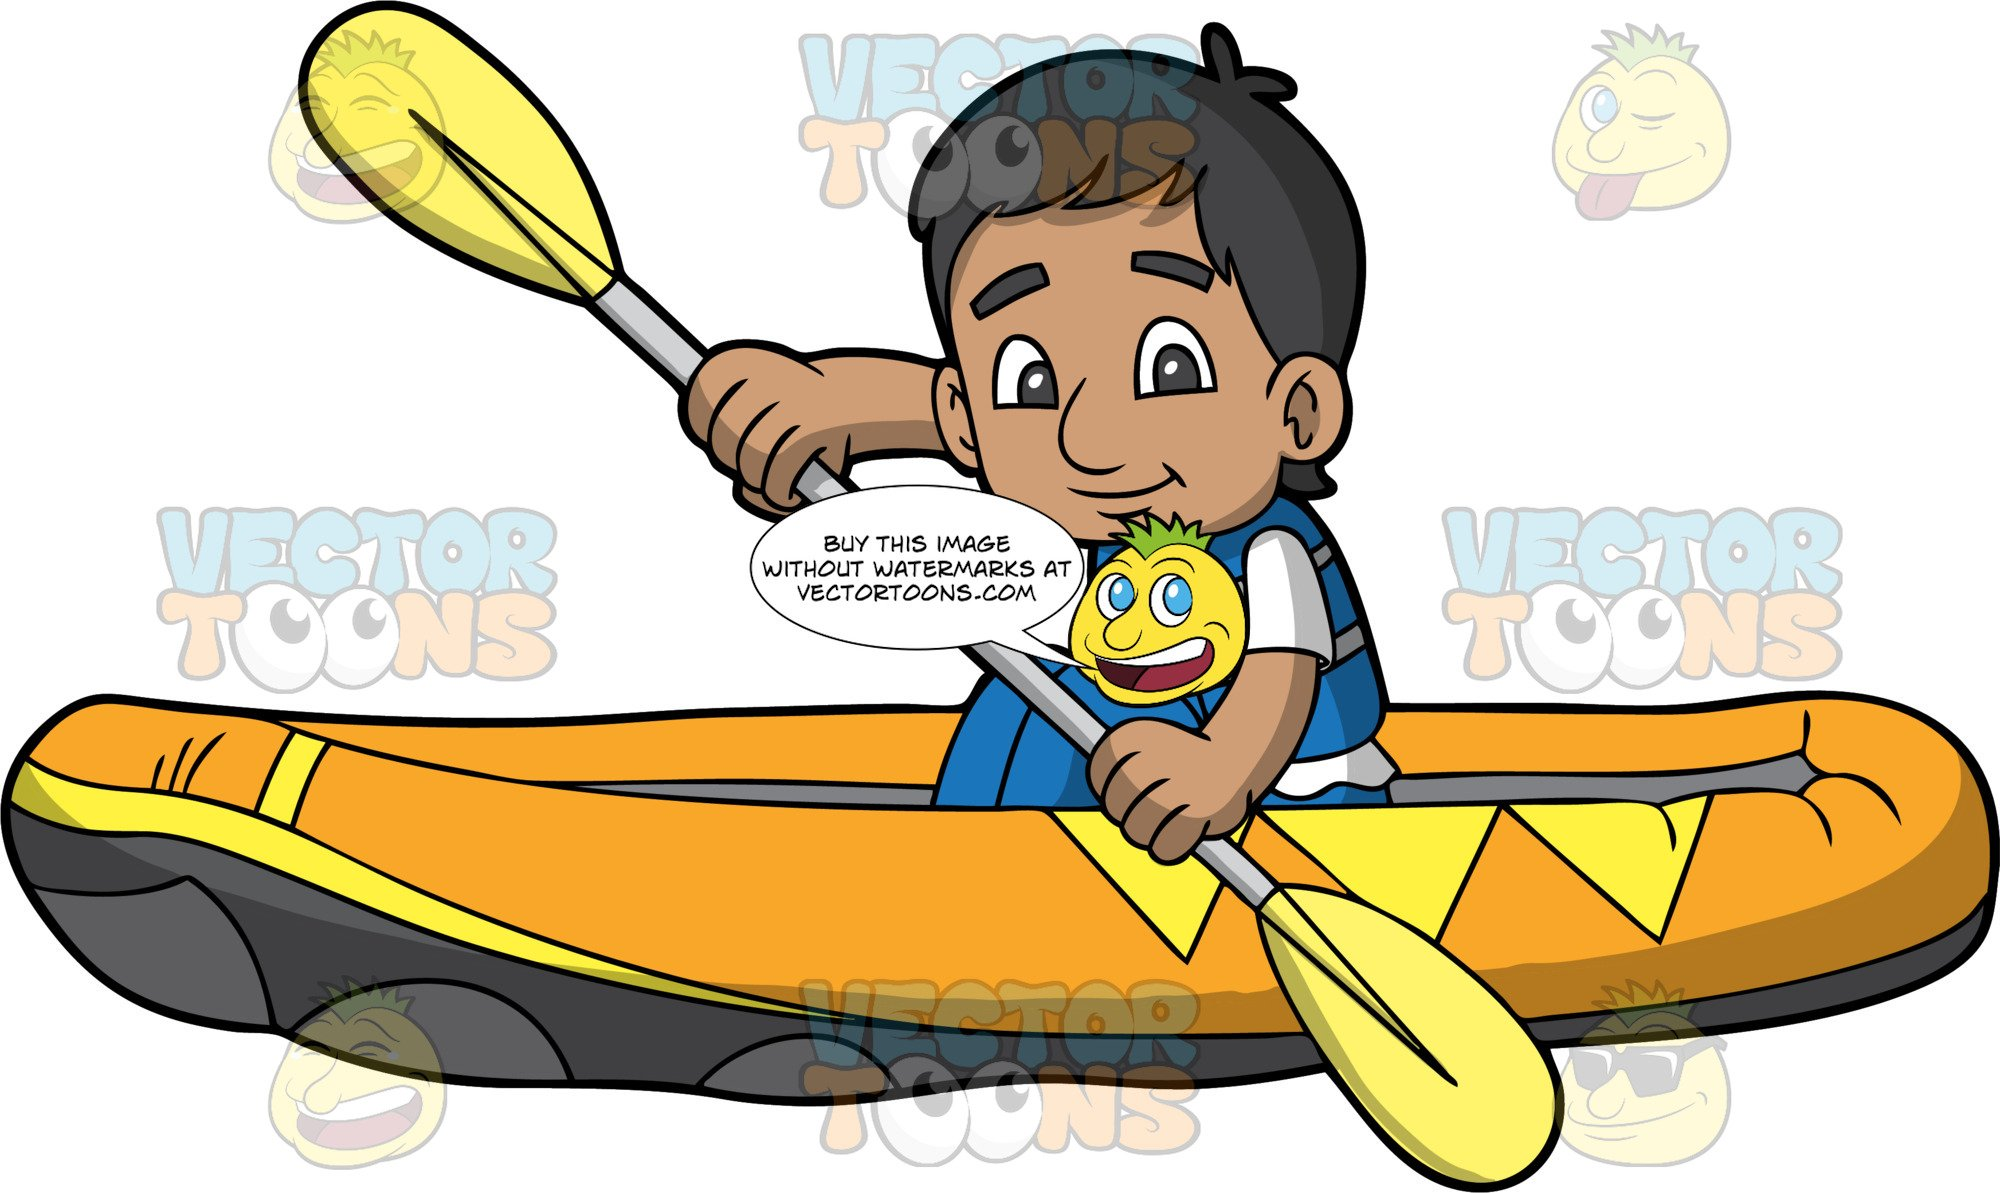 An Indian Boy Paddling His Raft Through Some Calm Water.